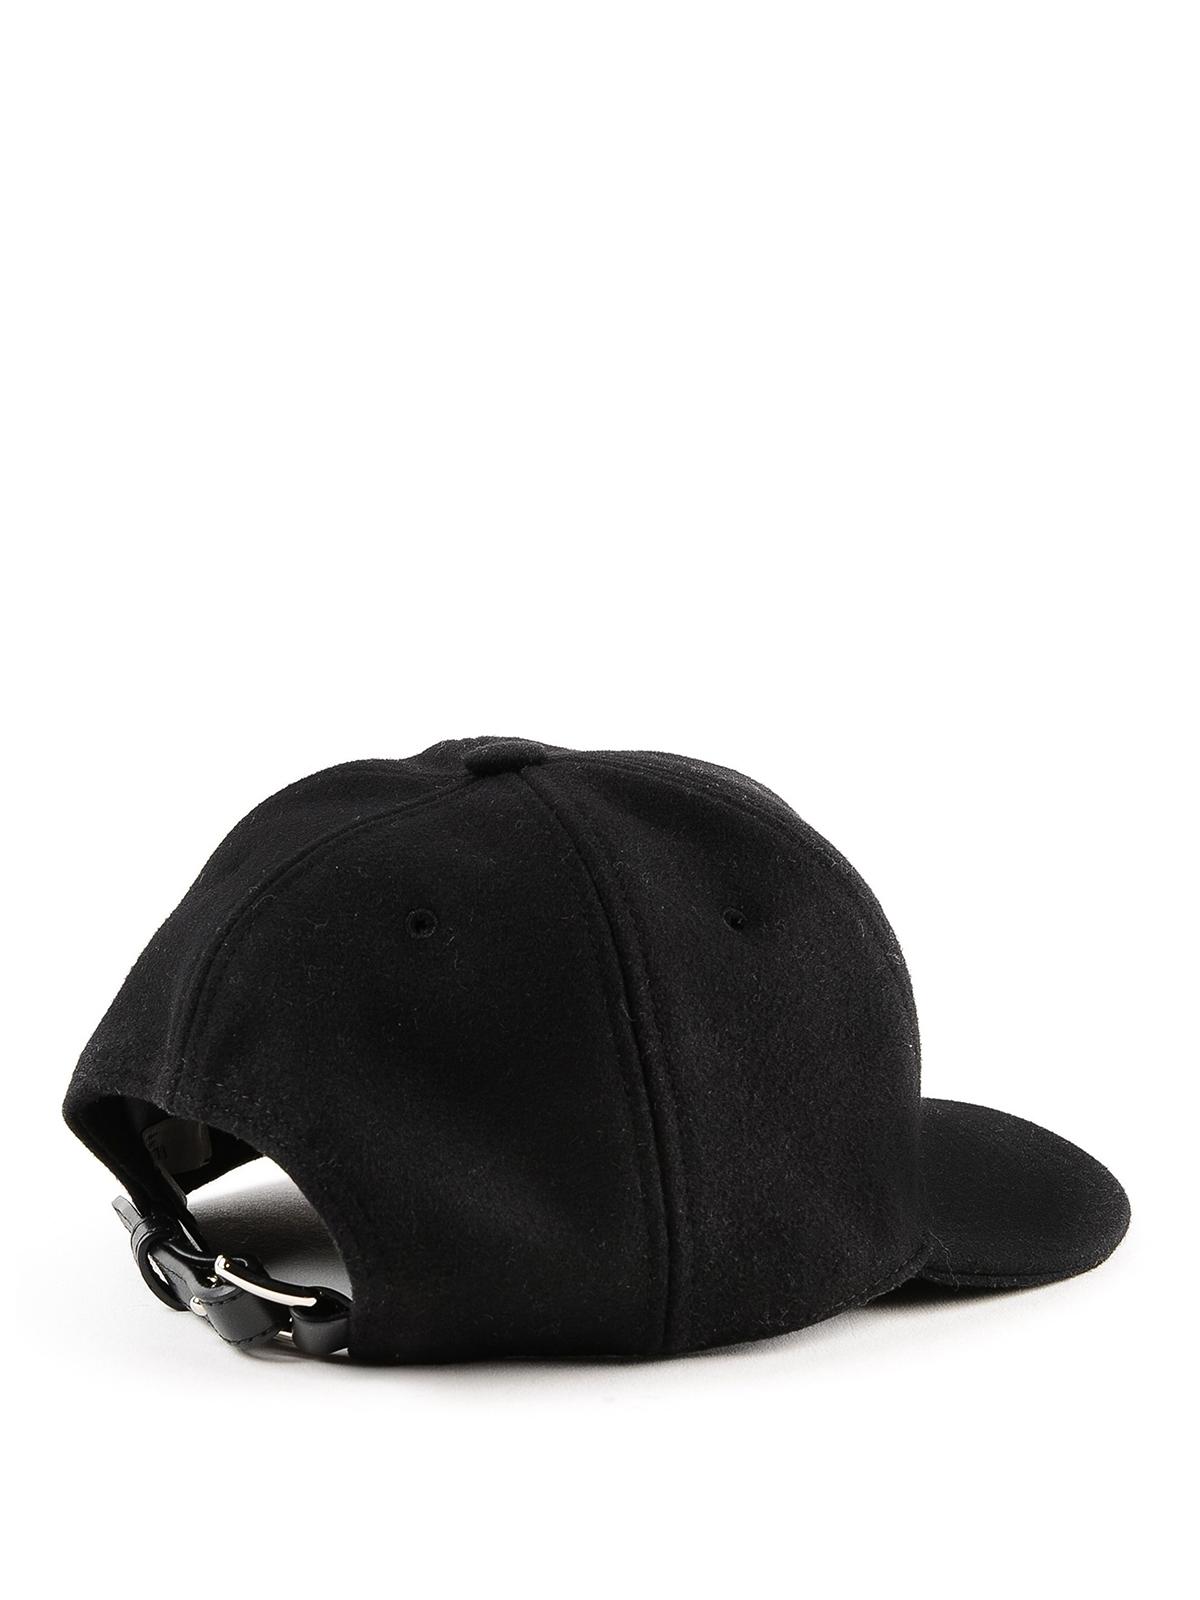 VALENTINO GARAVANI  hats   caps online - VLTN wool blend baseball cap f7d0051b44a0